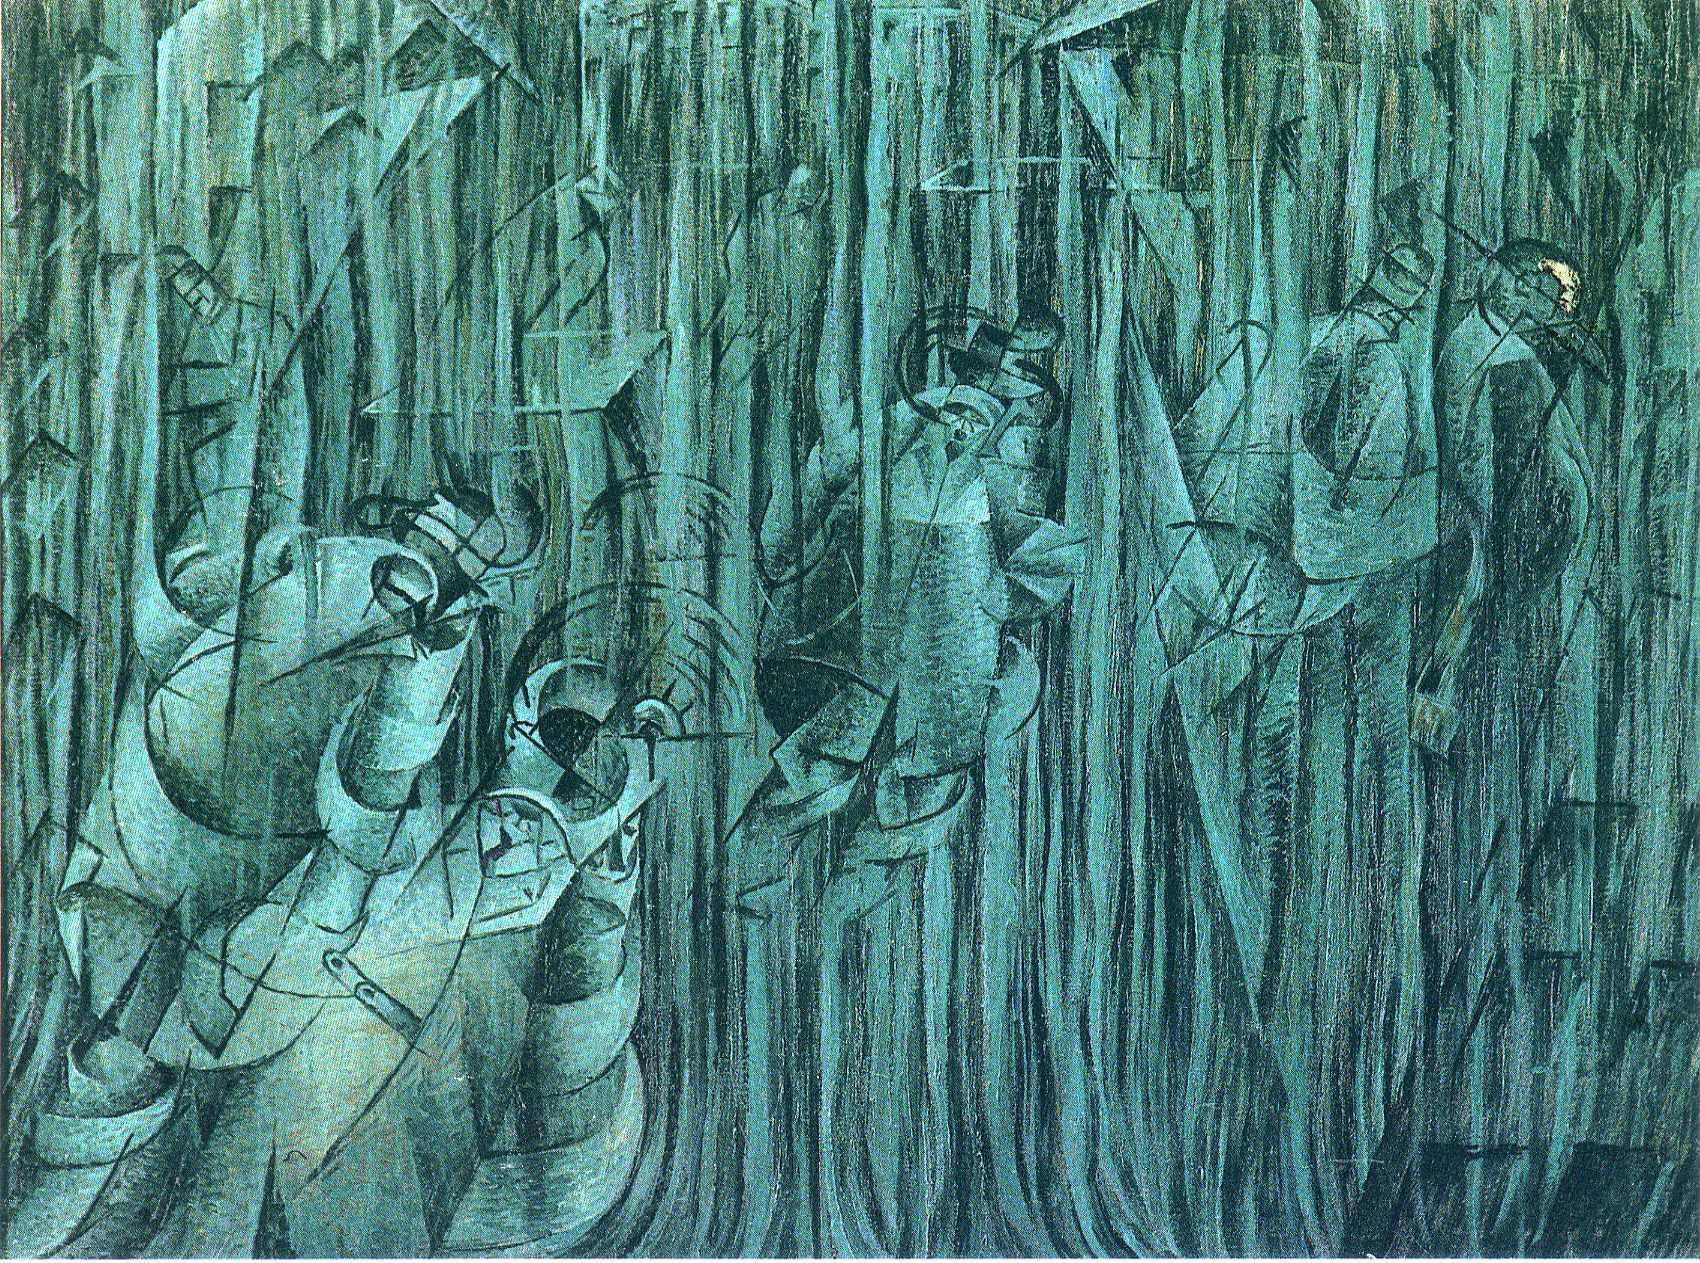 Boccioni Futurism States of Mind III: Th...